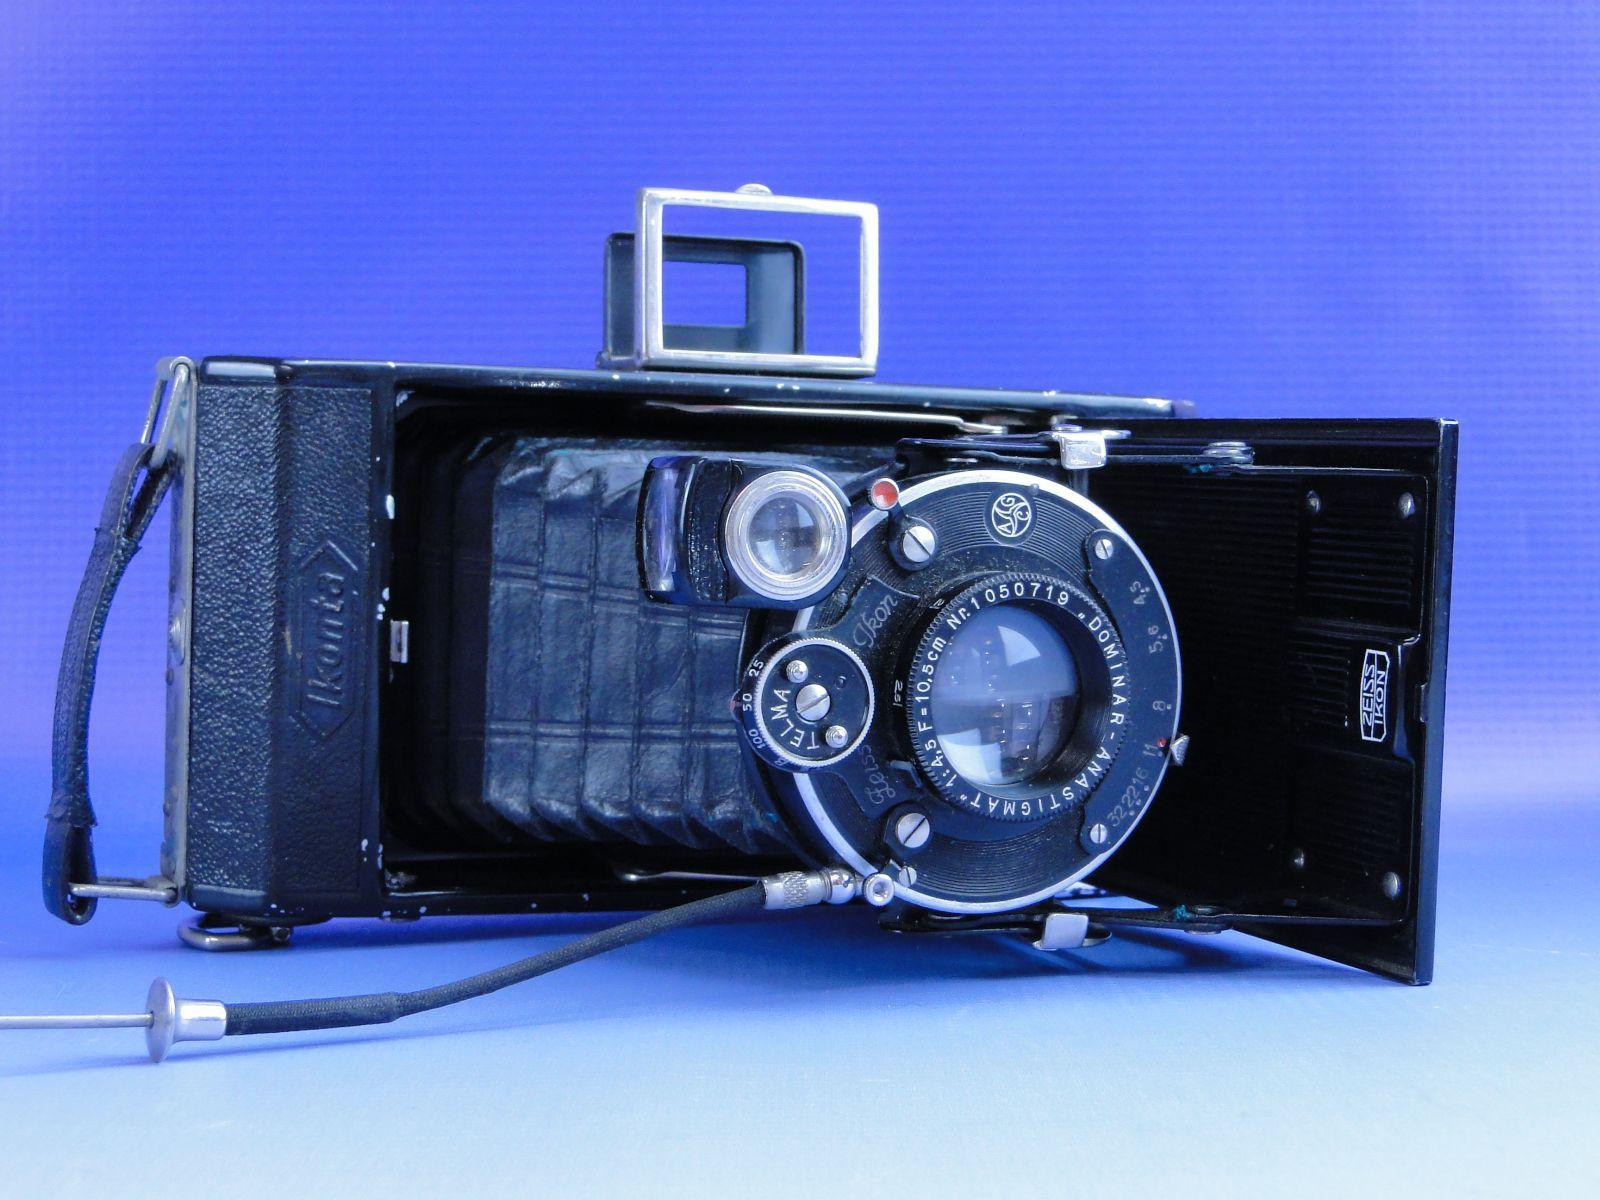 DSC07301.JPG (1600×1200)